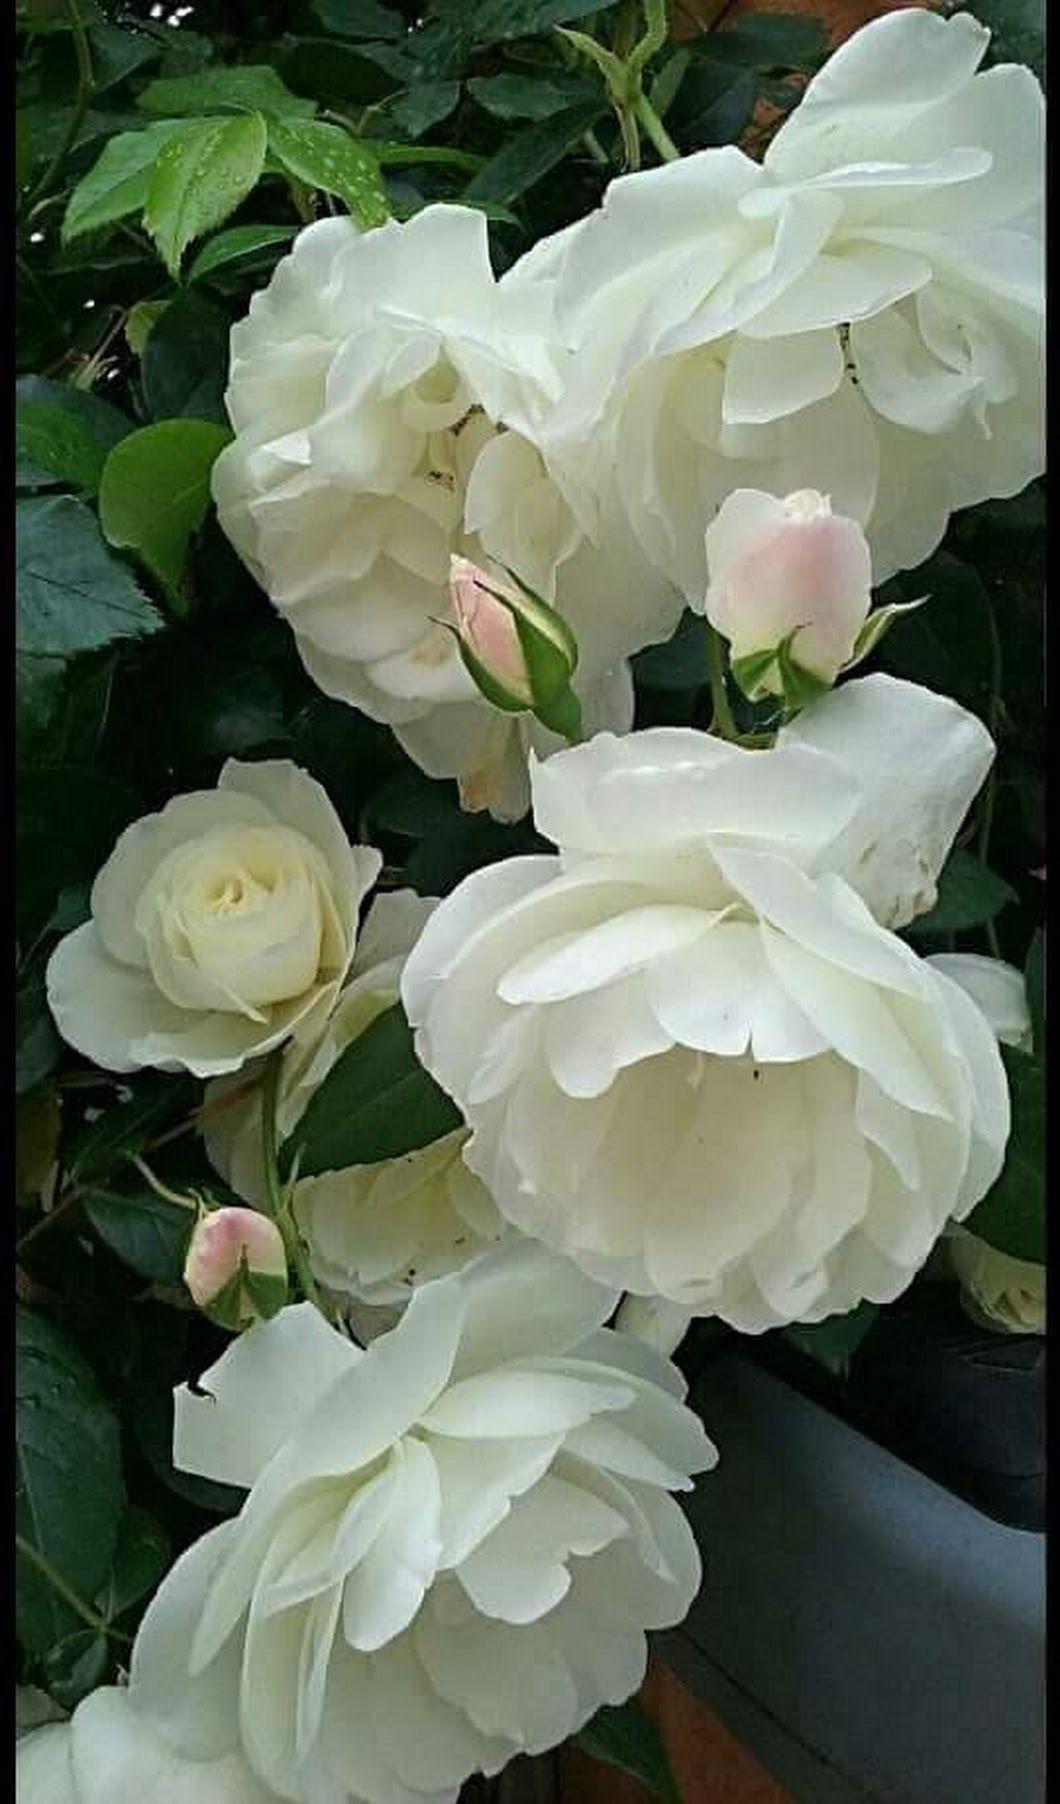 Pin By Gabriella On Fleur Pinterest Flowers Flower And Gardens